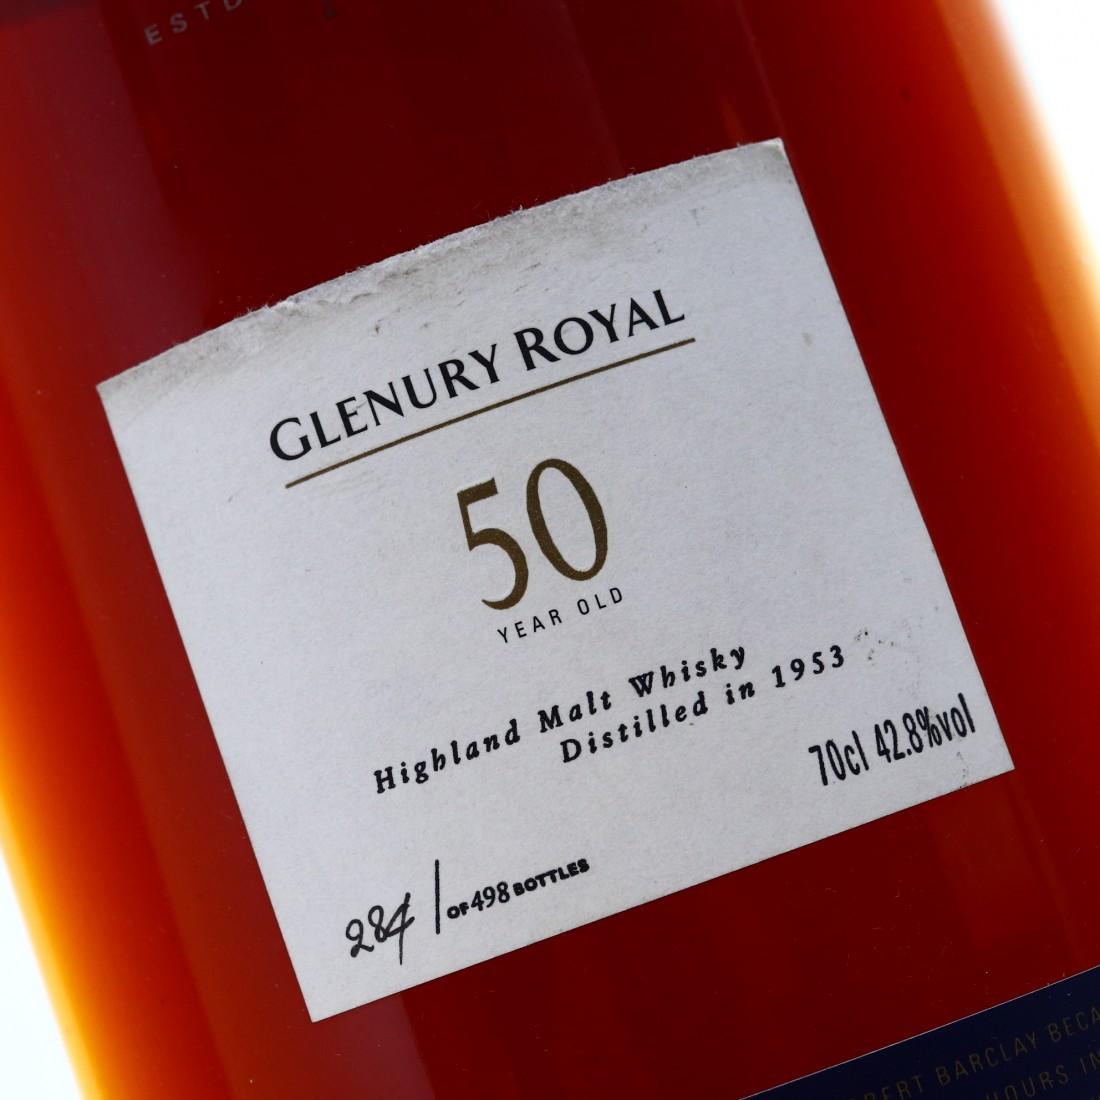 Glenury Royal 1953 Cask Strength 50 Year Old